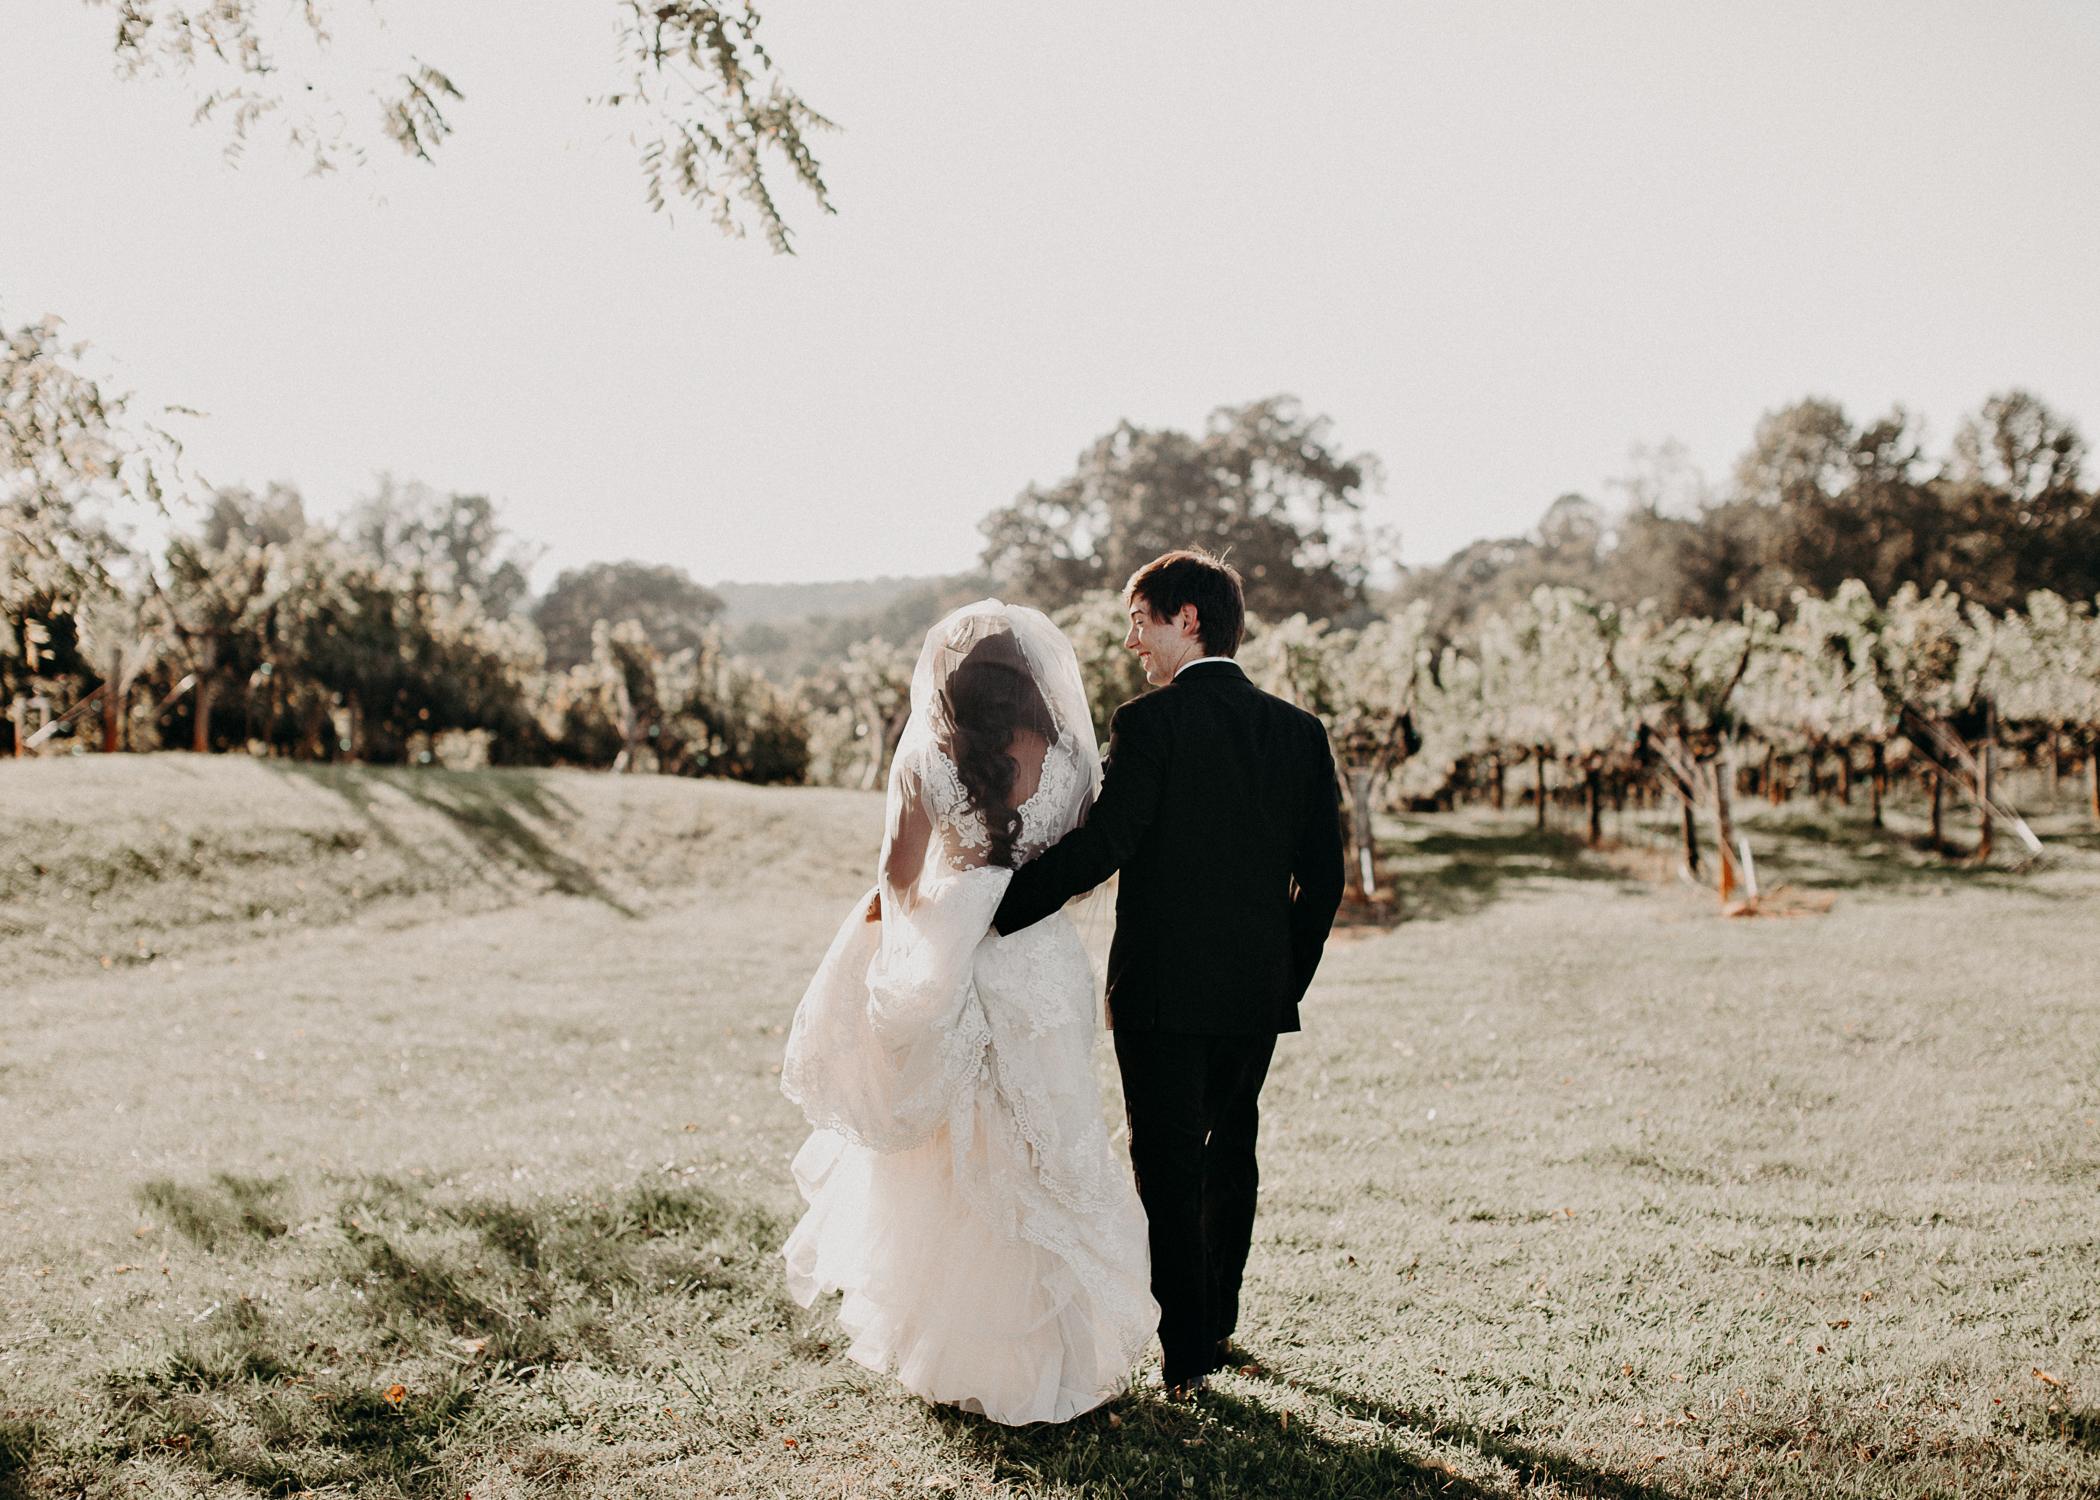 41- Kaya_vineyard_dahlonega_wedding_venue_Bride_and_groom_first_look_and_portraits_aline_marin_photography.jpg